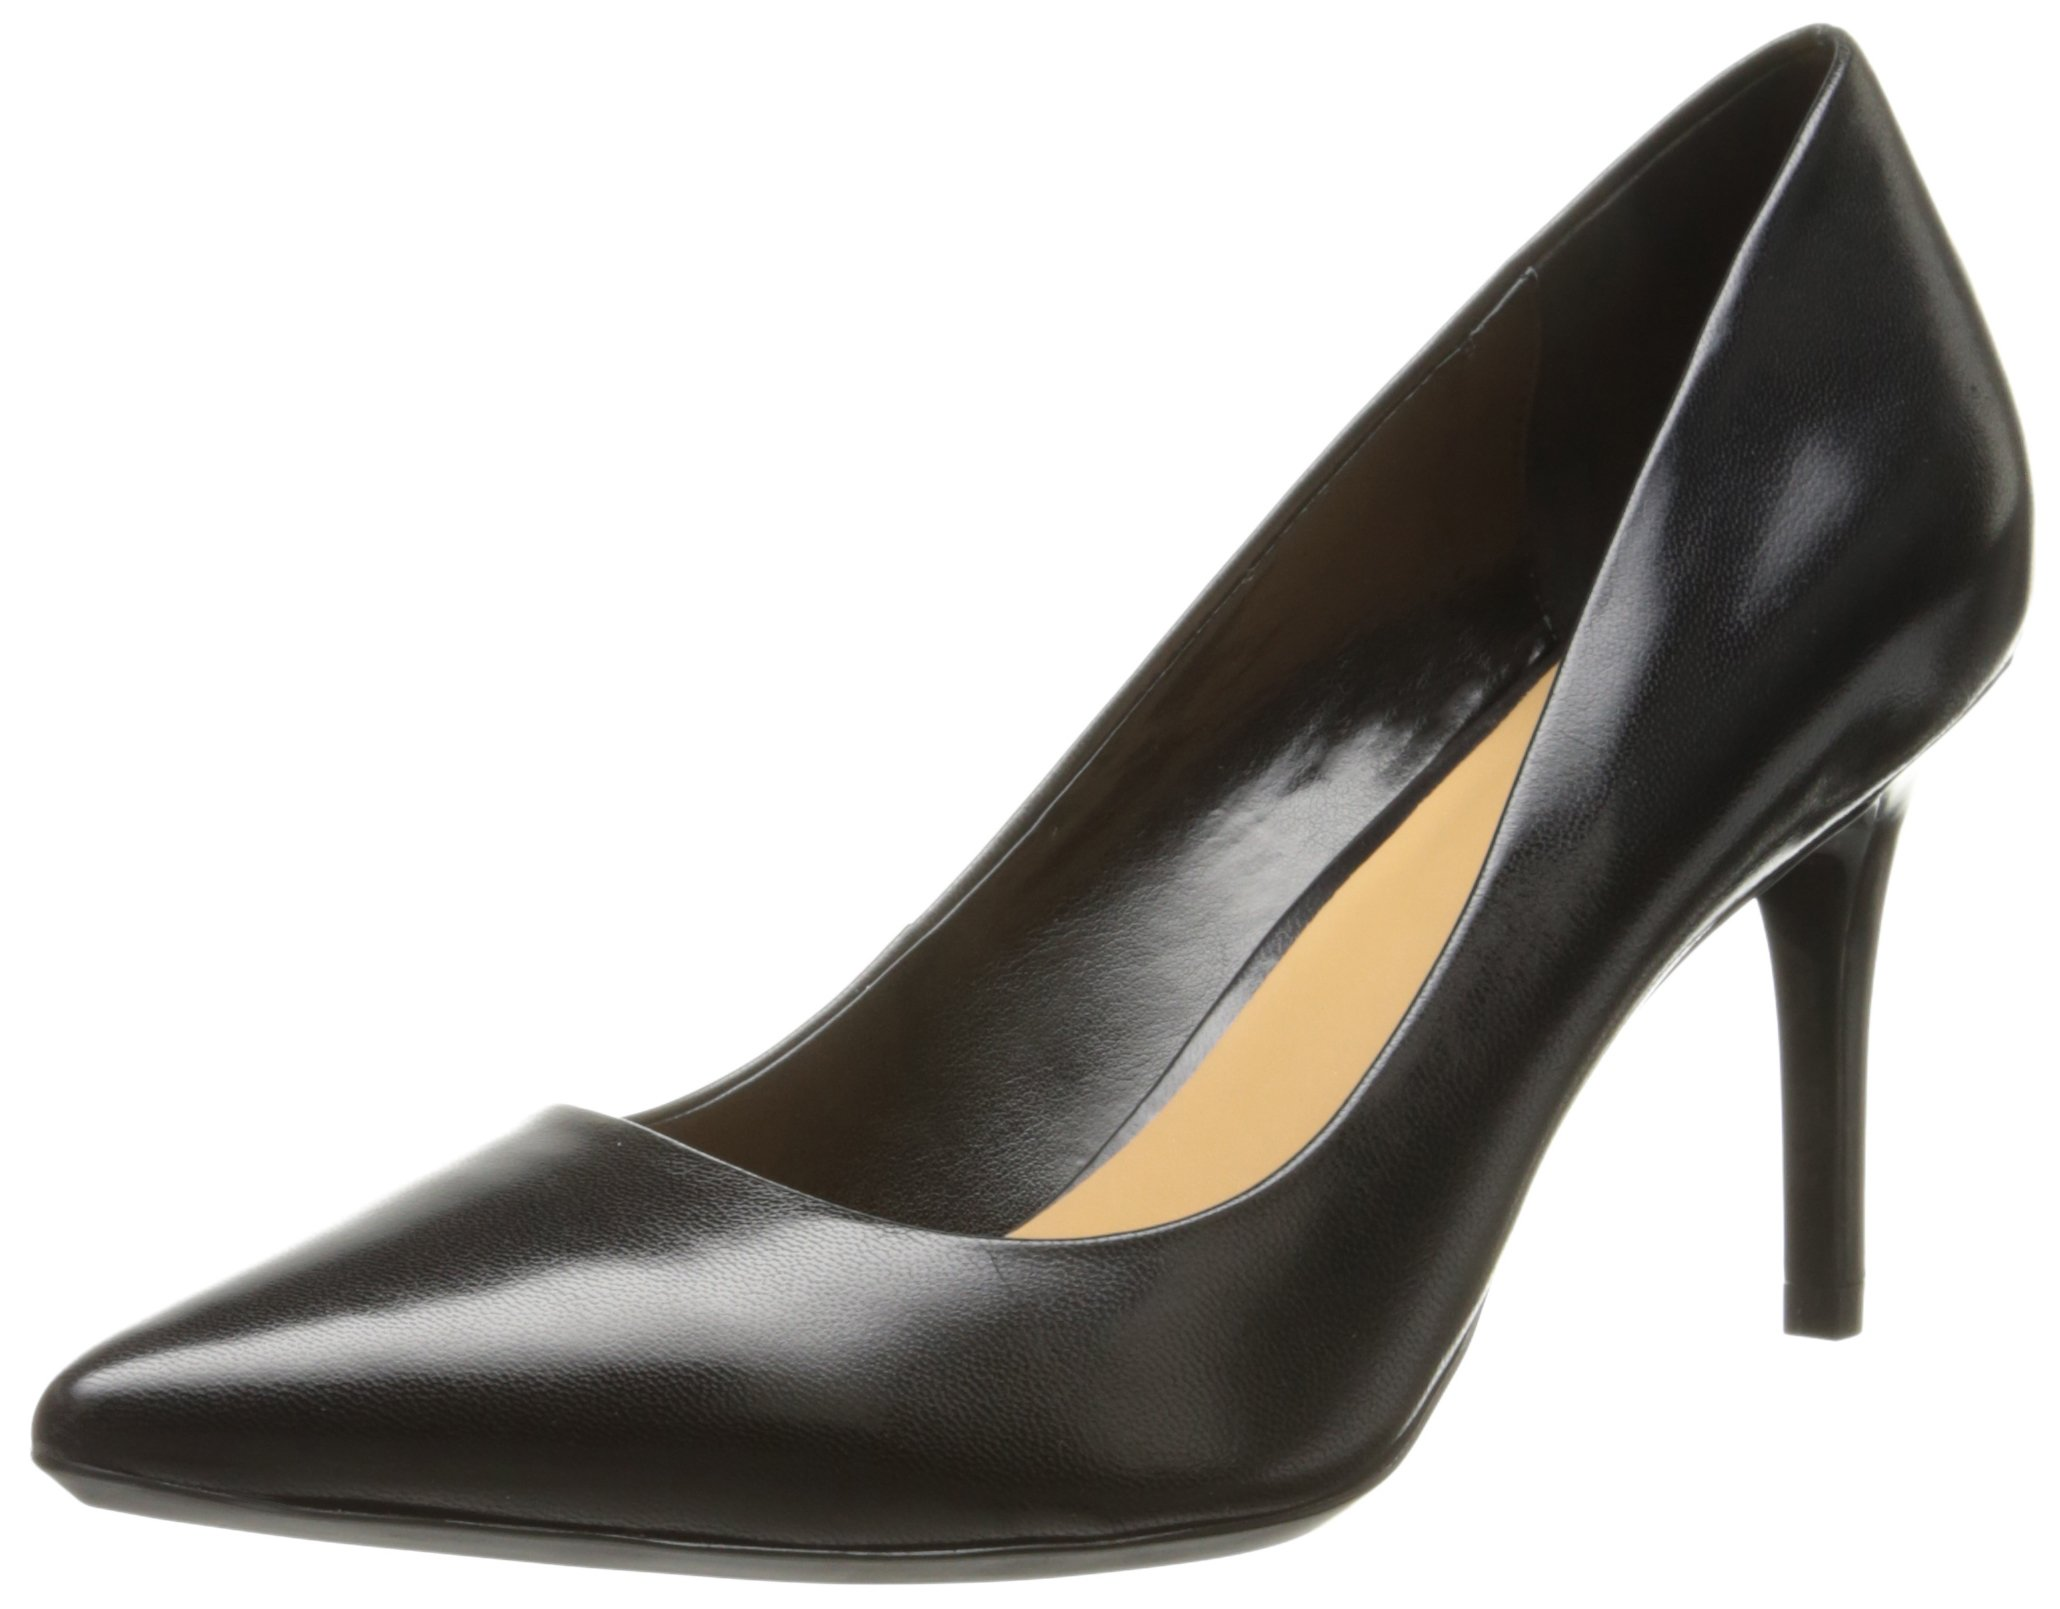 Calvin Klein Women's Gayle Pump, Black Leather - 8 B(M) US